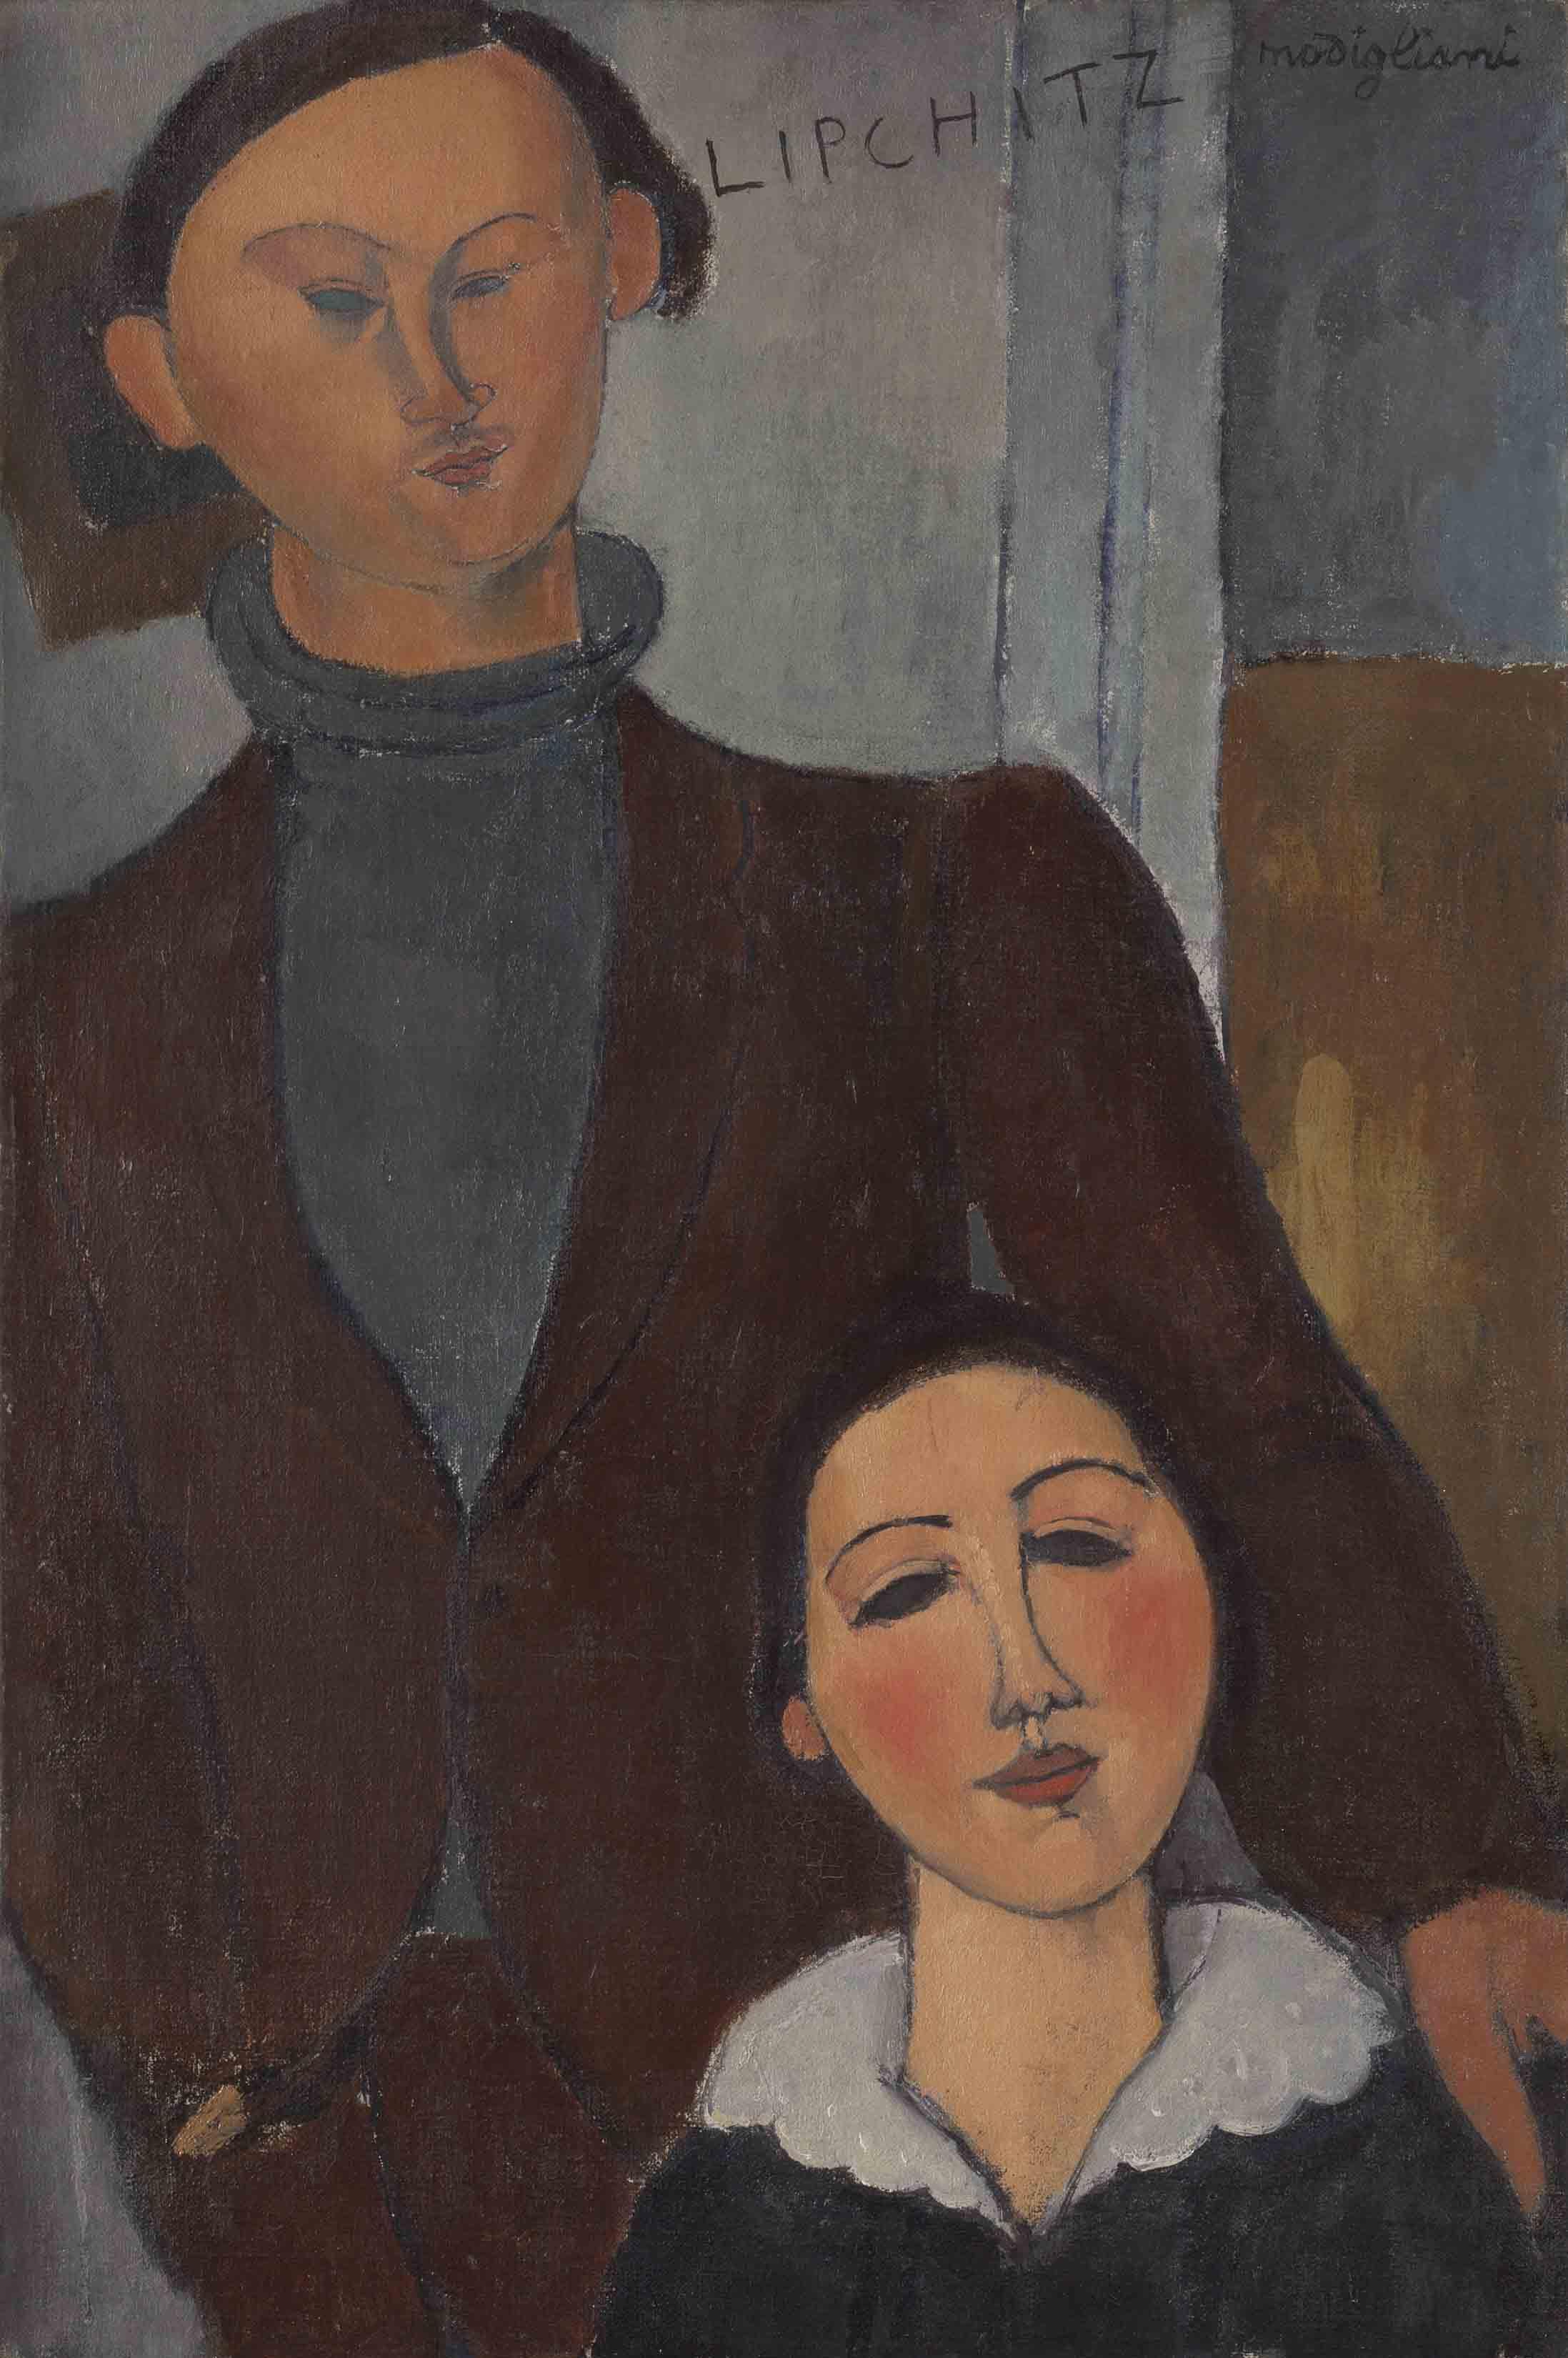 Jacques and Berthe Lipchitz, 1916